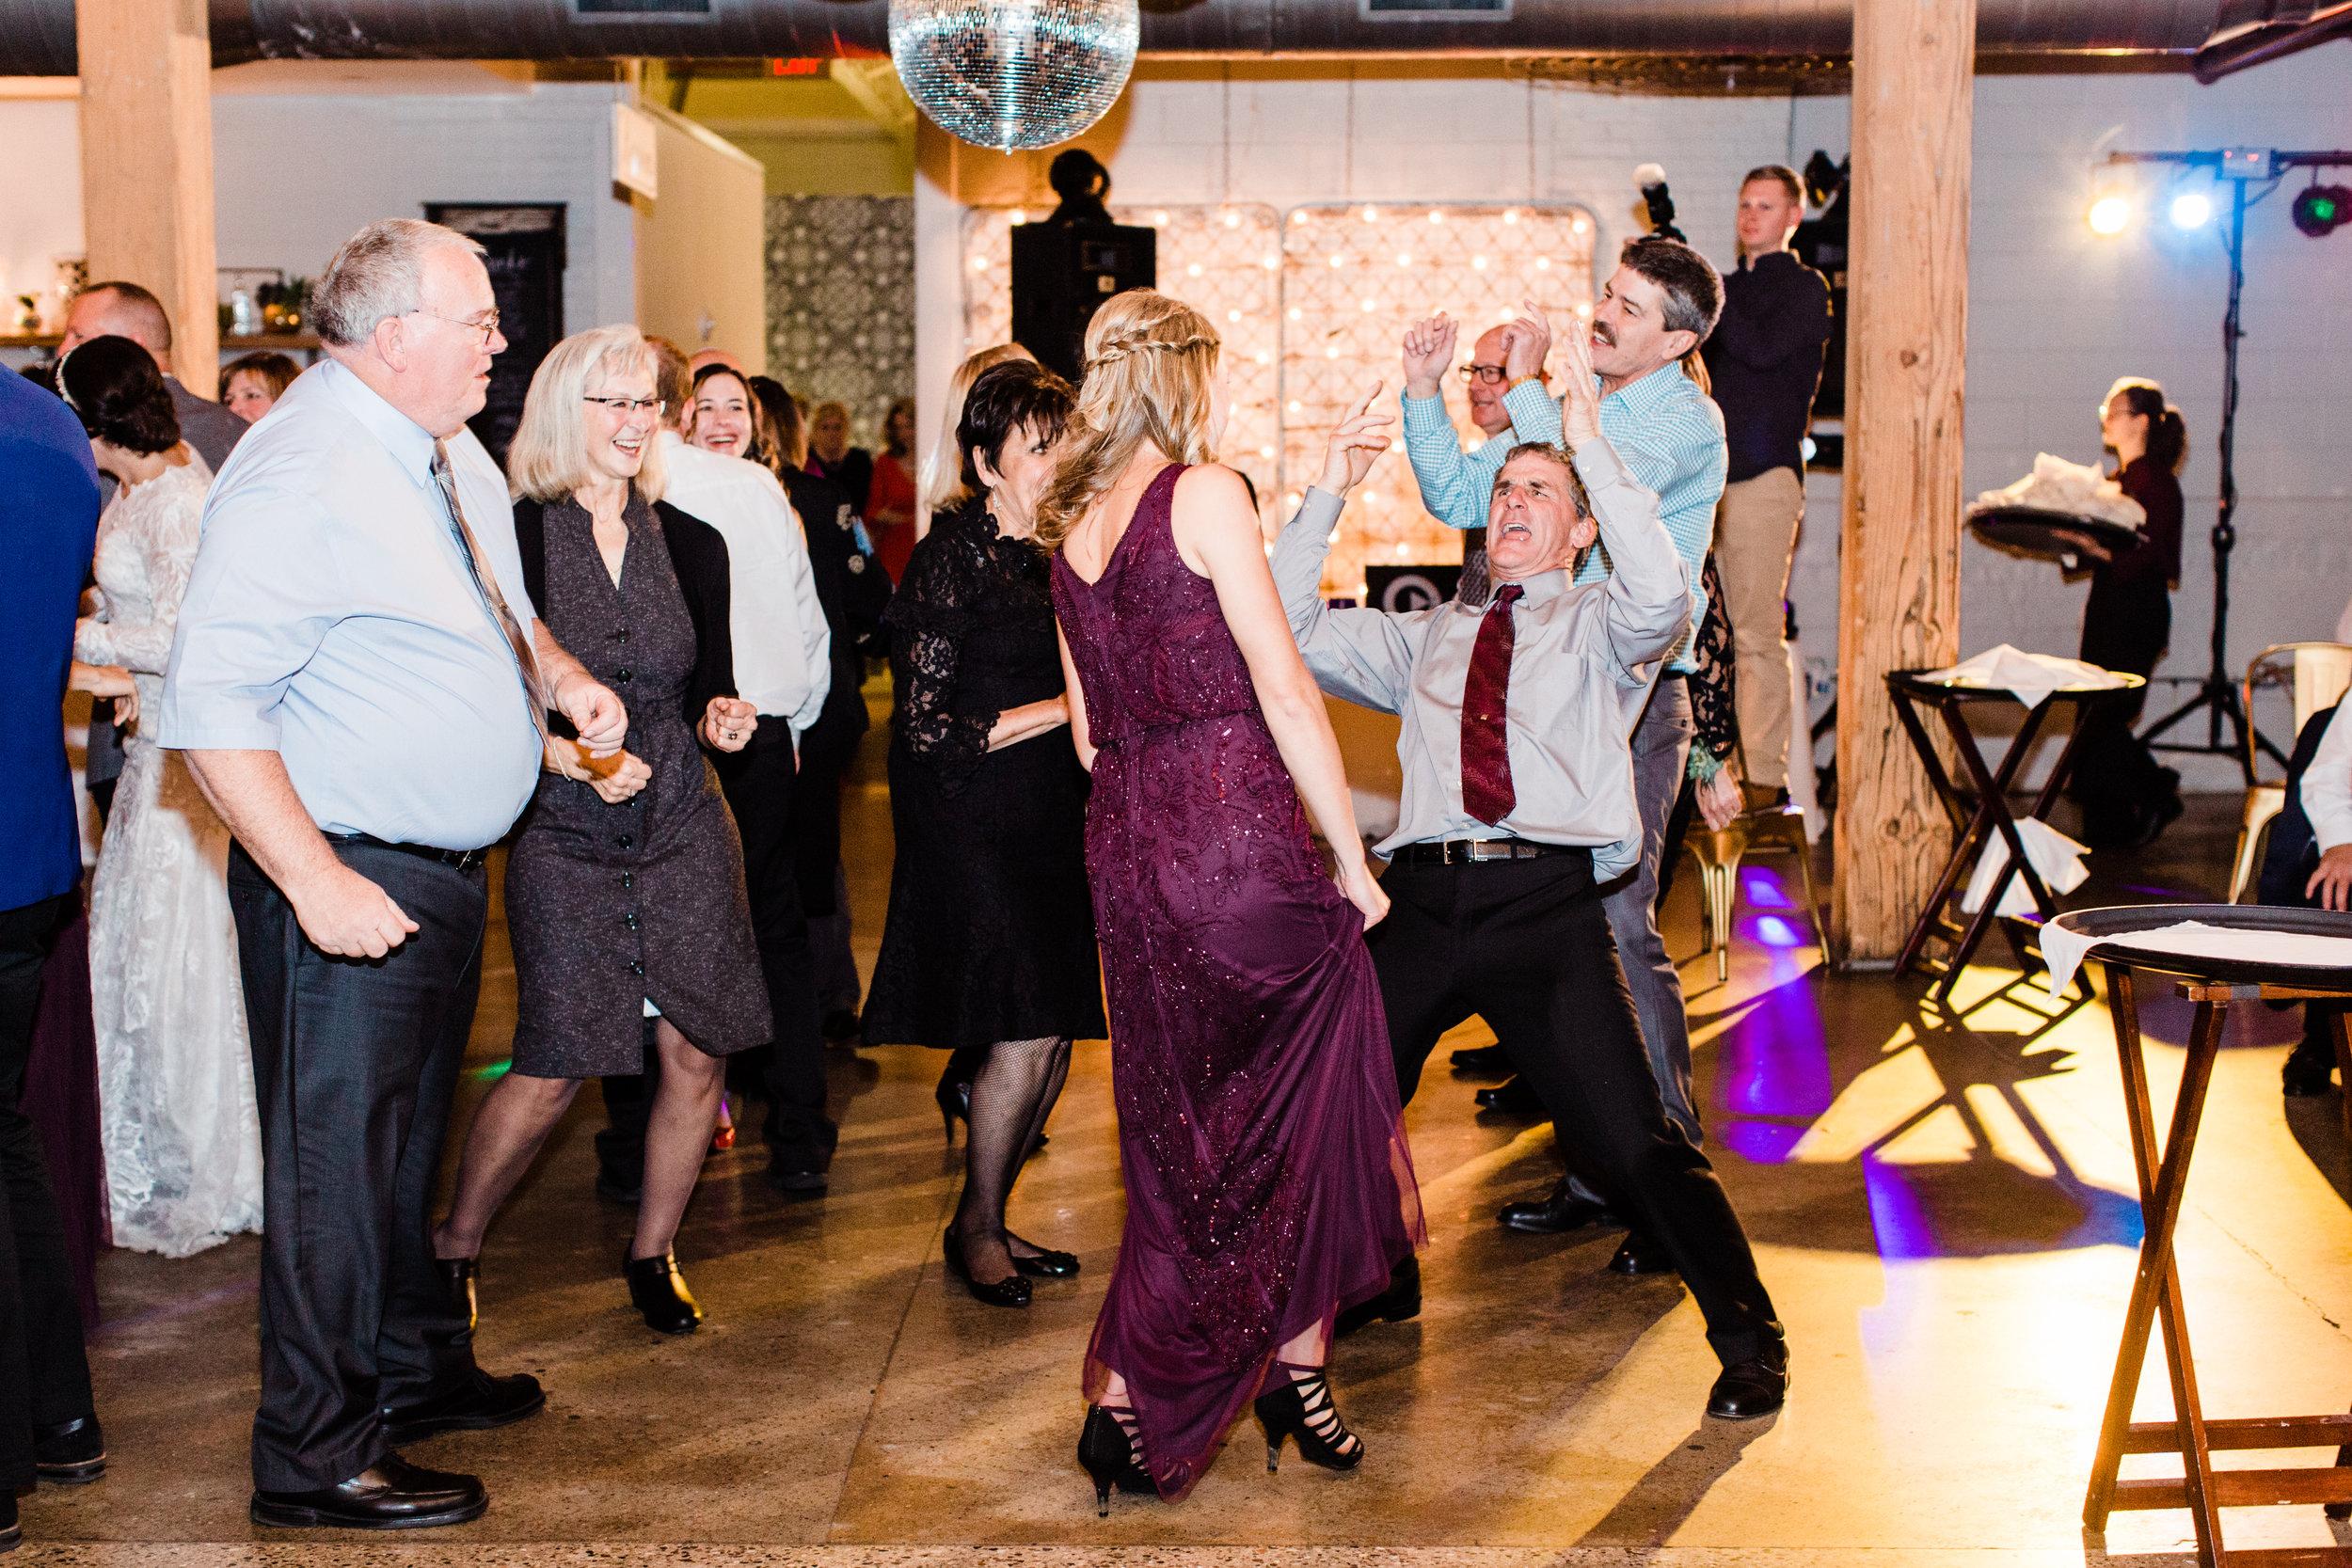 Vogelzang+Wedding+Reception+Dancing2-24.jpg